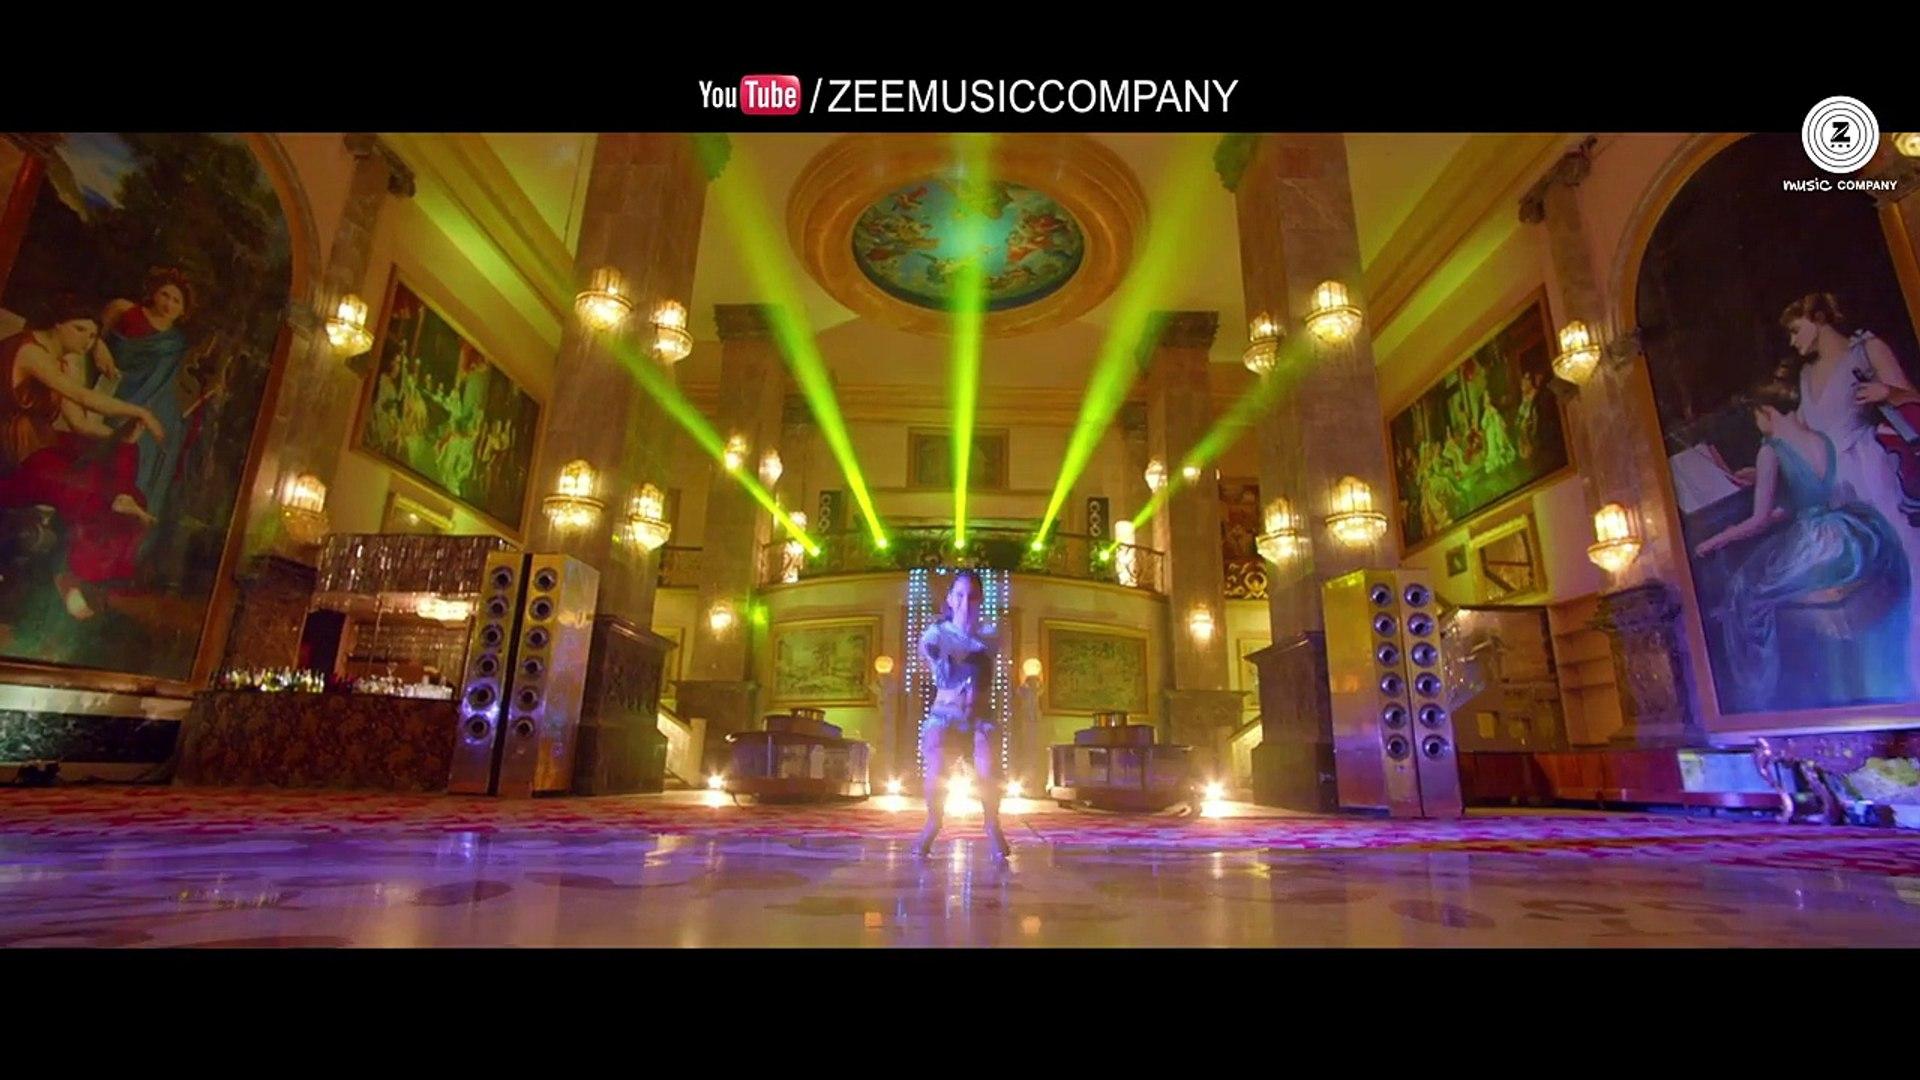 Baby Marvake Maanegi/Raftaar/Nora Fatehi/Remo D'souza/Official Music Video